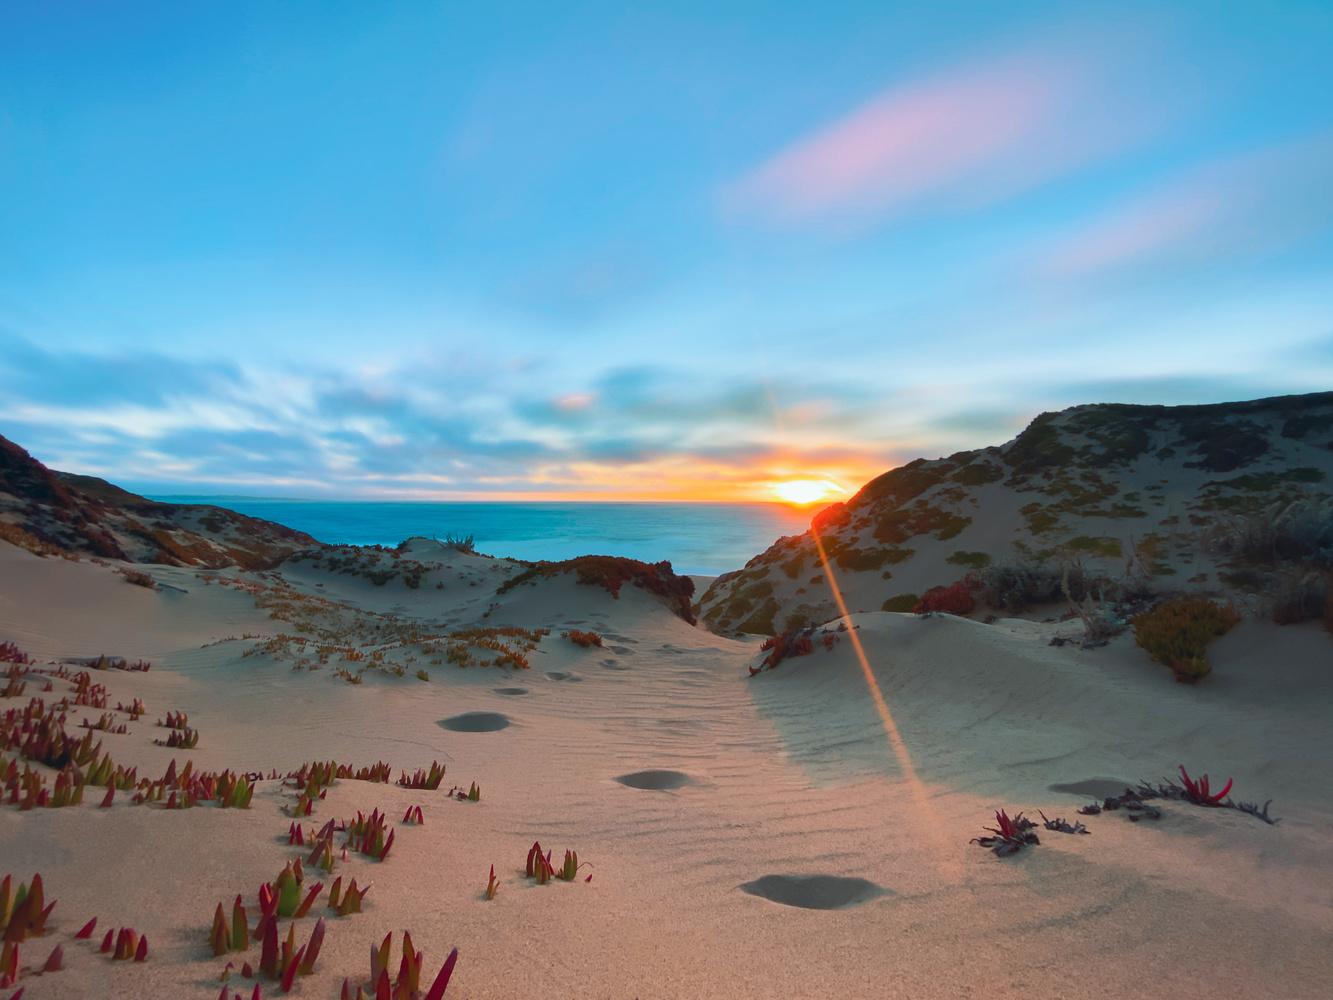 Cerulean Sunset by Jonathan Monroe